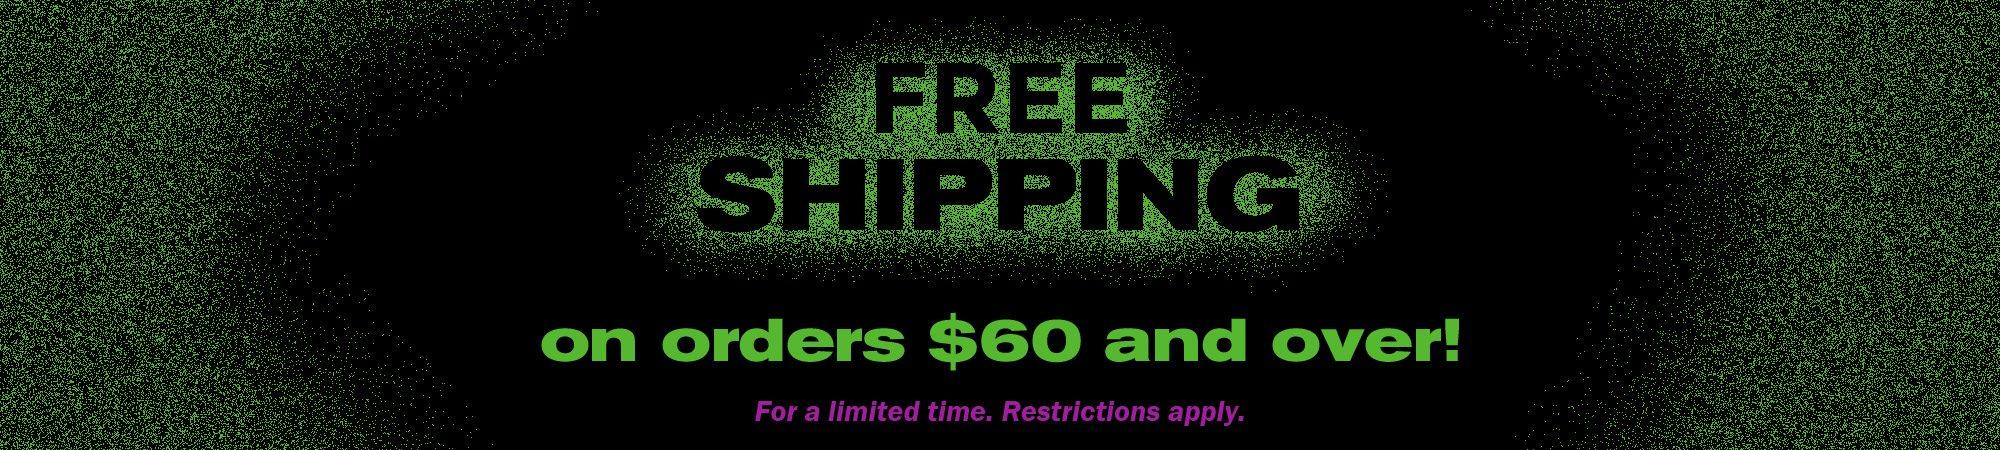 SockGuy_Free_Shipping2